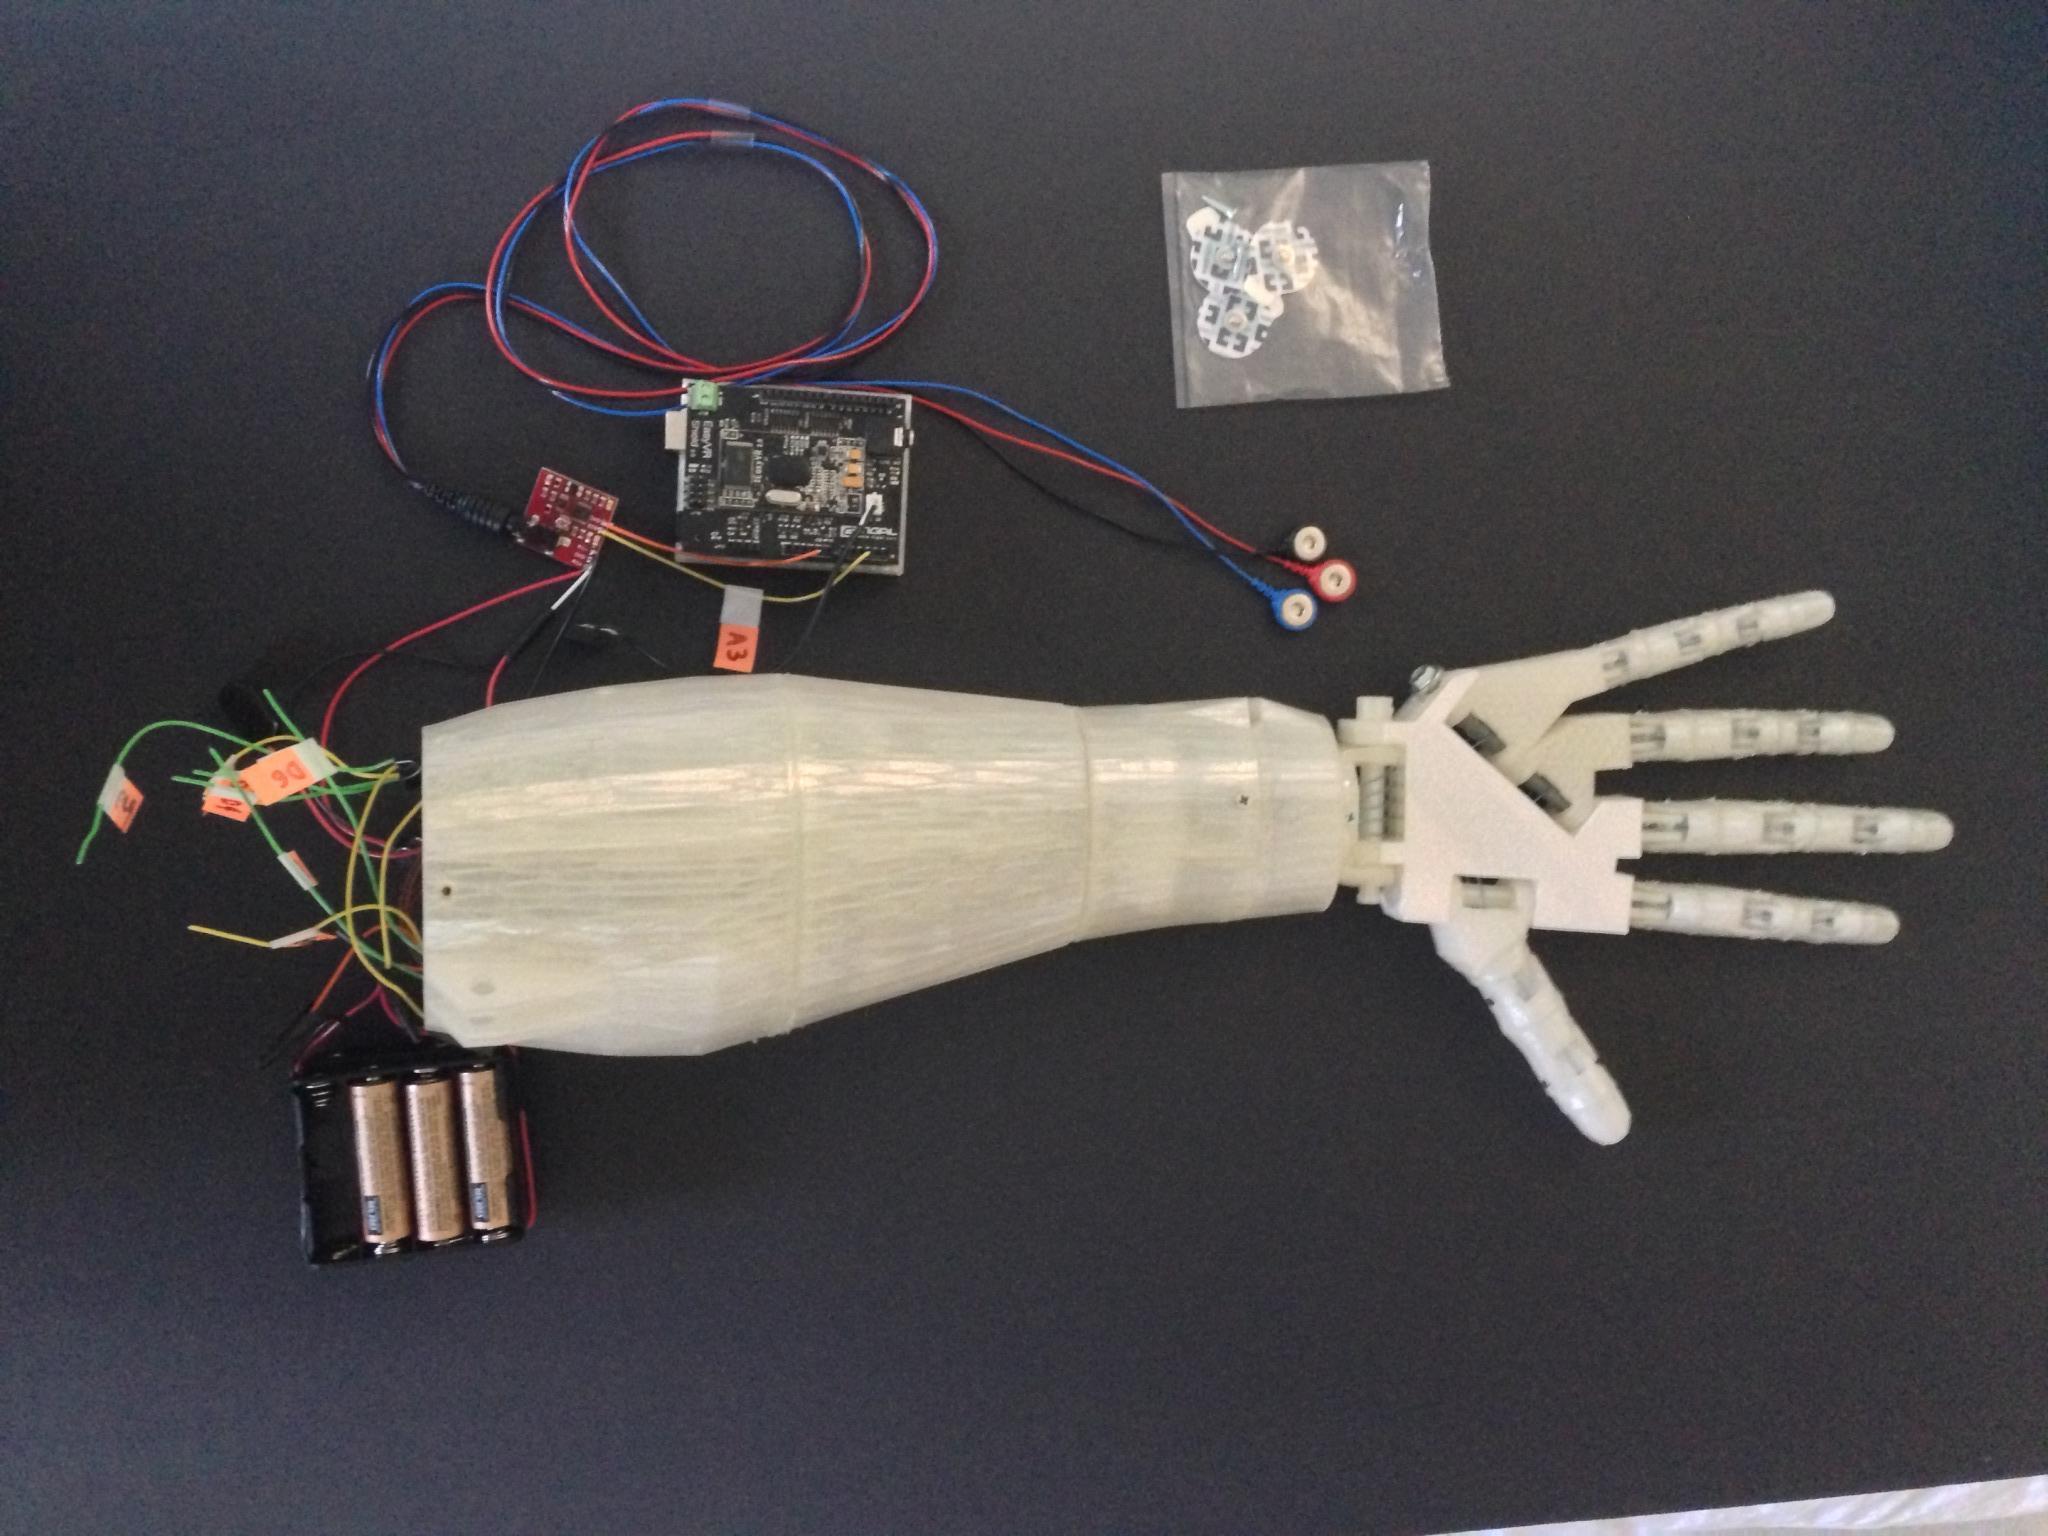 3d Printing Wallpaper Hd High School Student 3d Prints Voice Controlled Robotic Arm